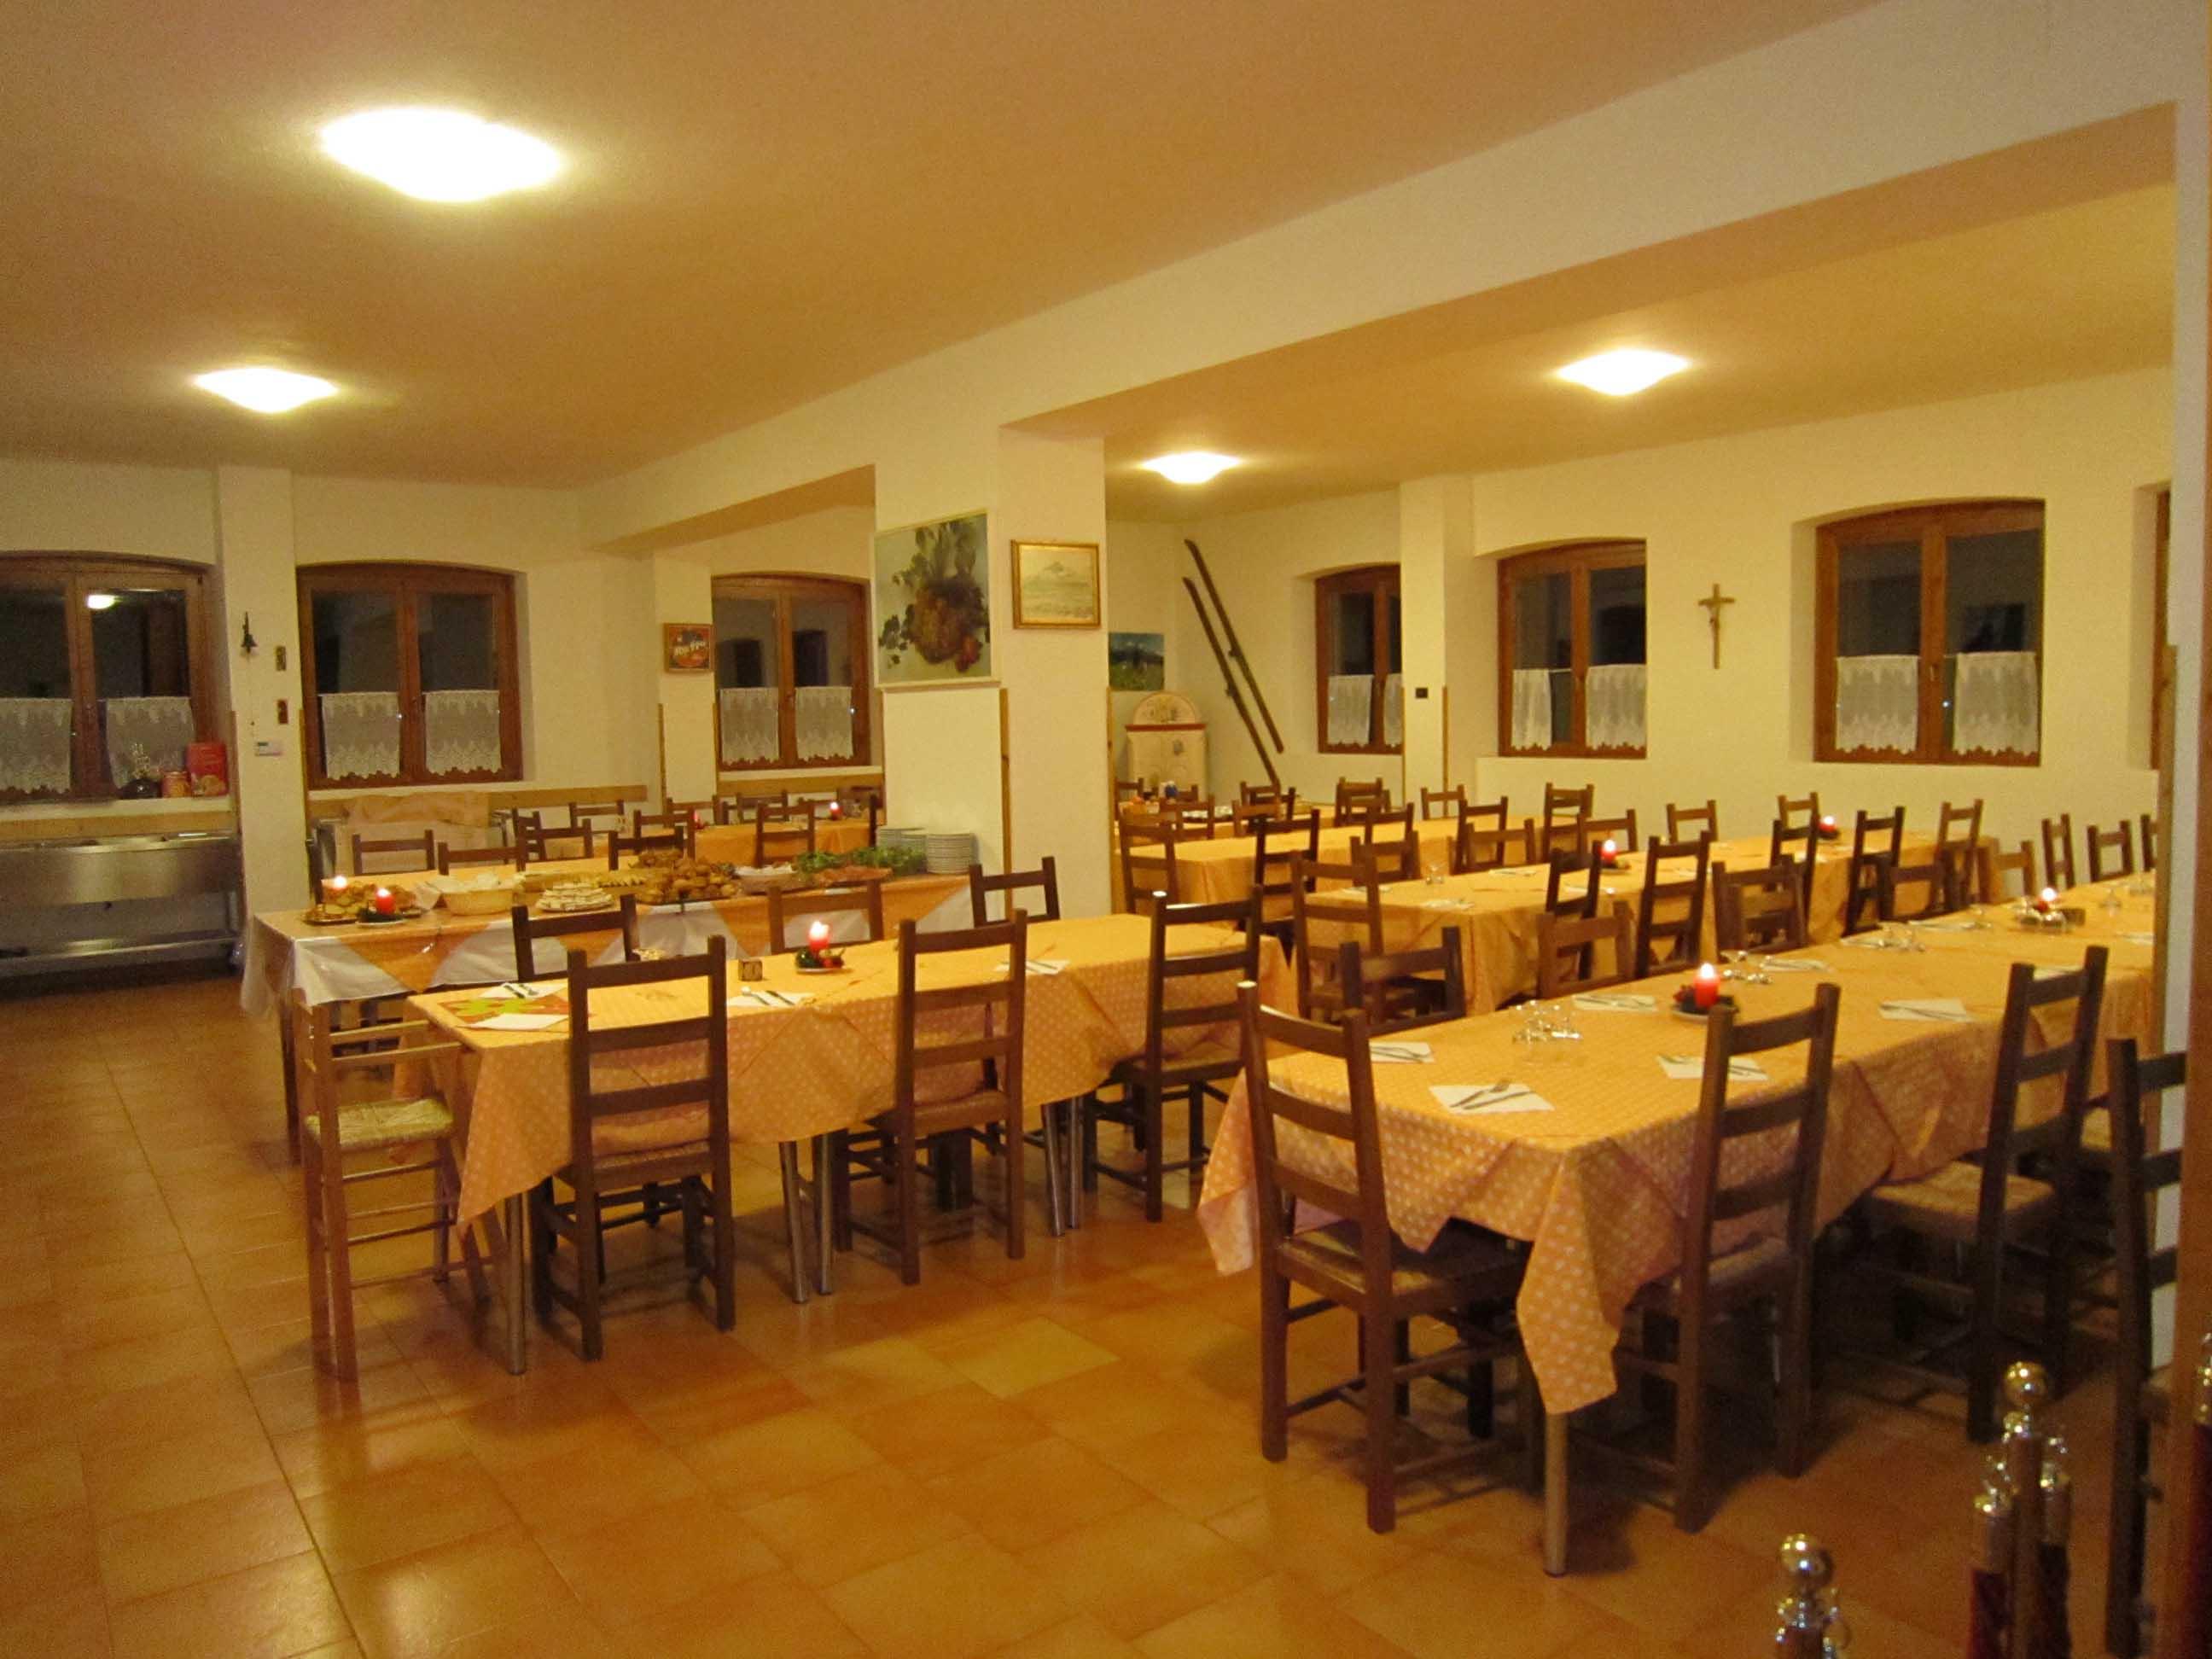 Casa Alpina A Canale D'Agordo (BL) Rif. 358 #BF3704 2592 1944 Nella Sala Da Pranzo In Francese